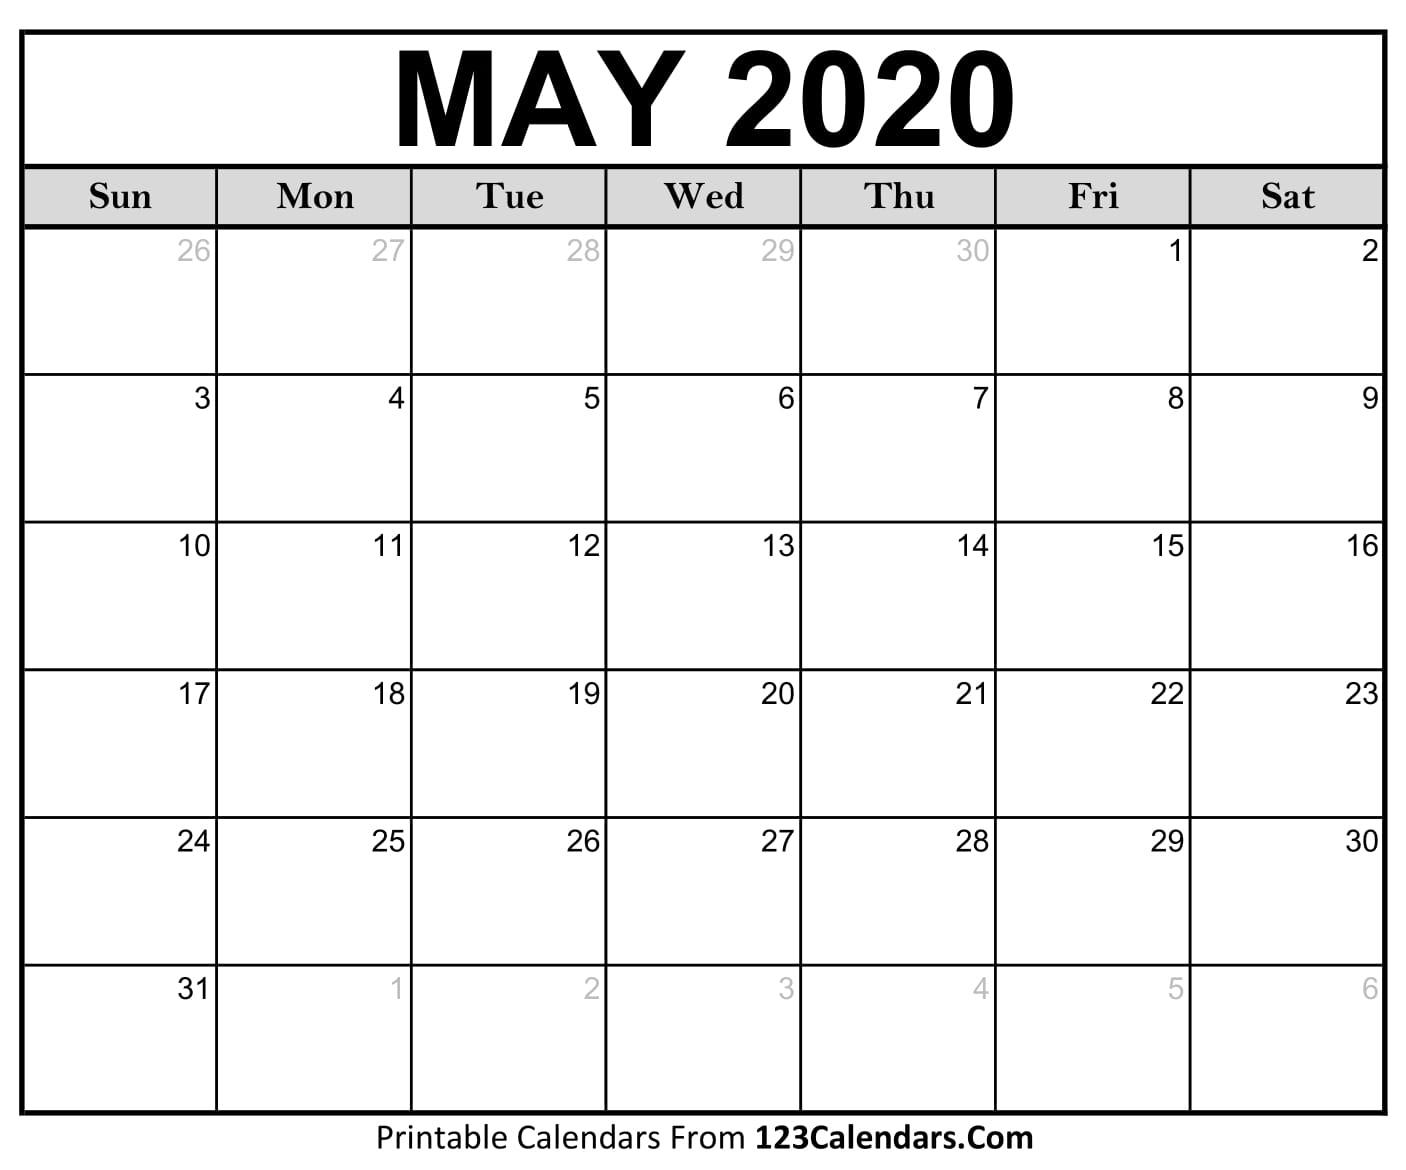 May 2020 Printable Calendar | 123Calendars